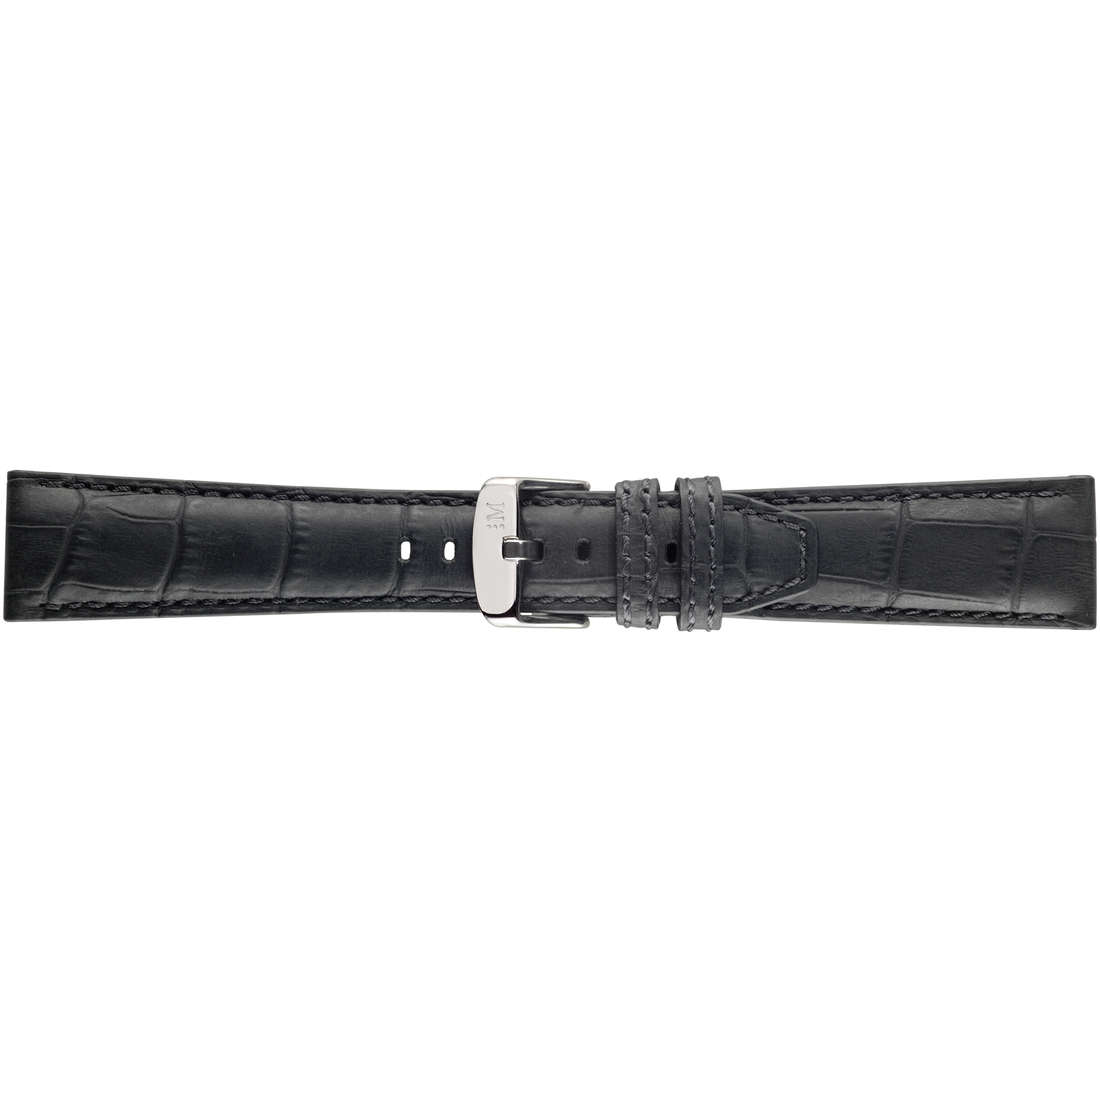 montre bande de montres homme Morellato Linea Sport A01X4497B44019CR22